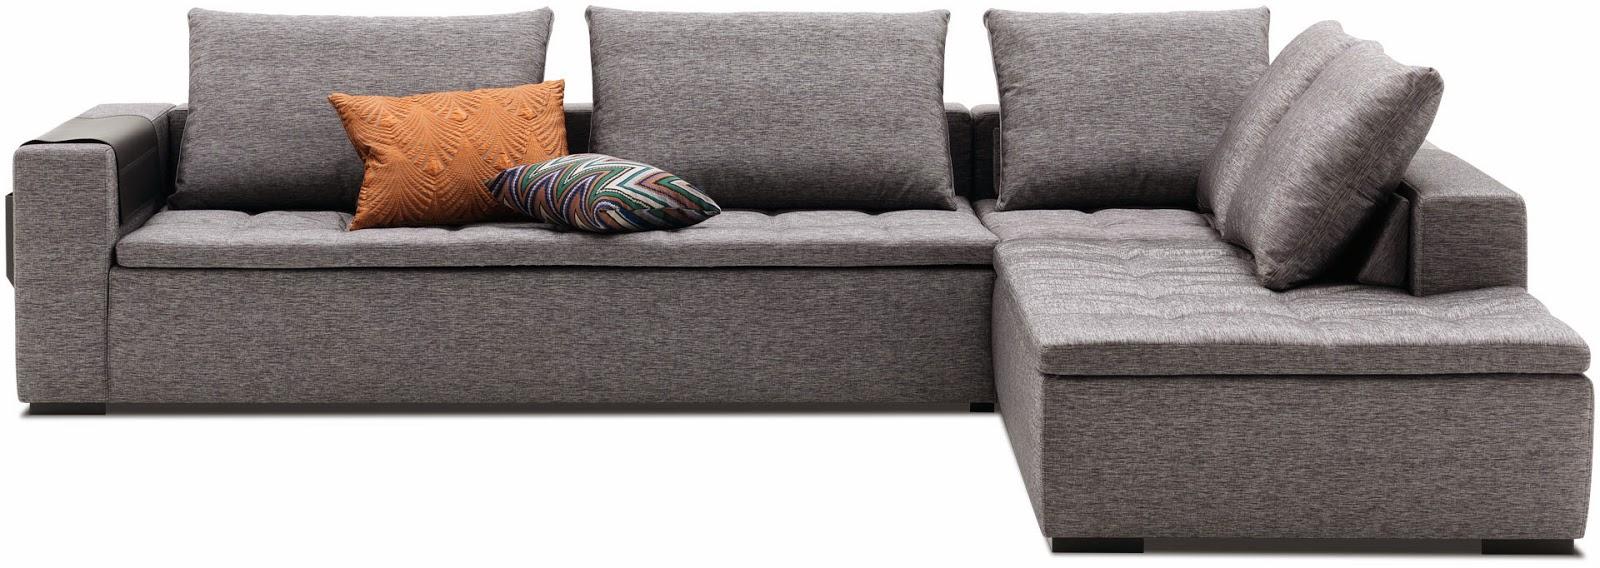 boconcept meet our team gervacio paja. Black Bedroom Furniture Sets. Home Design Ideas